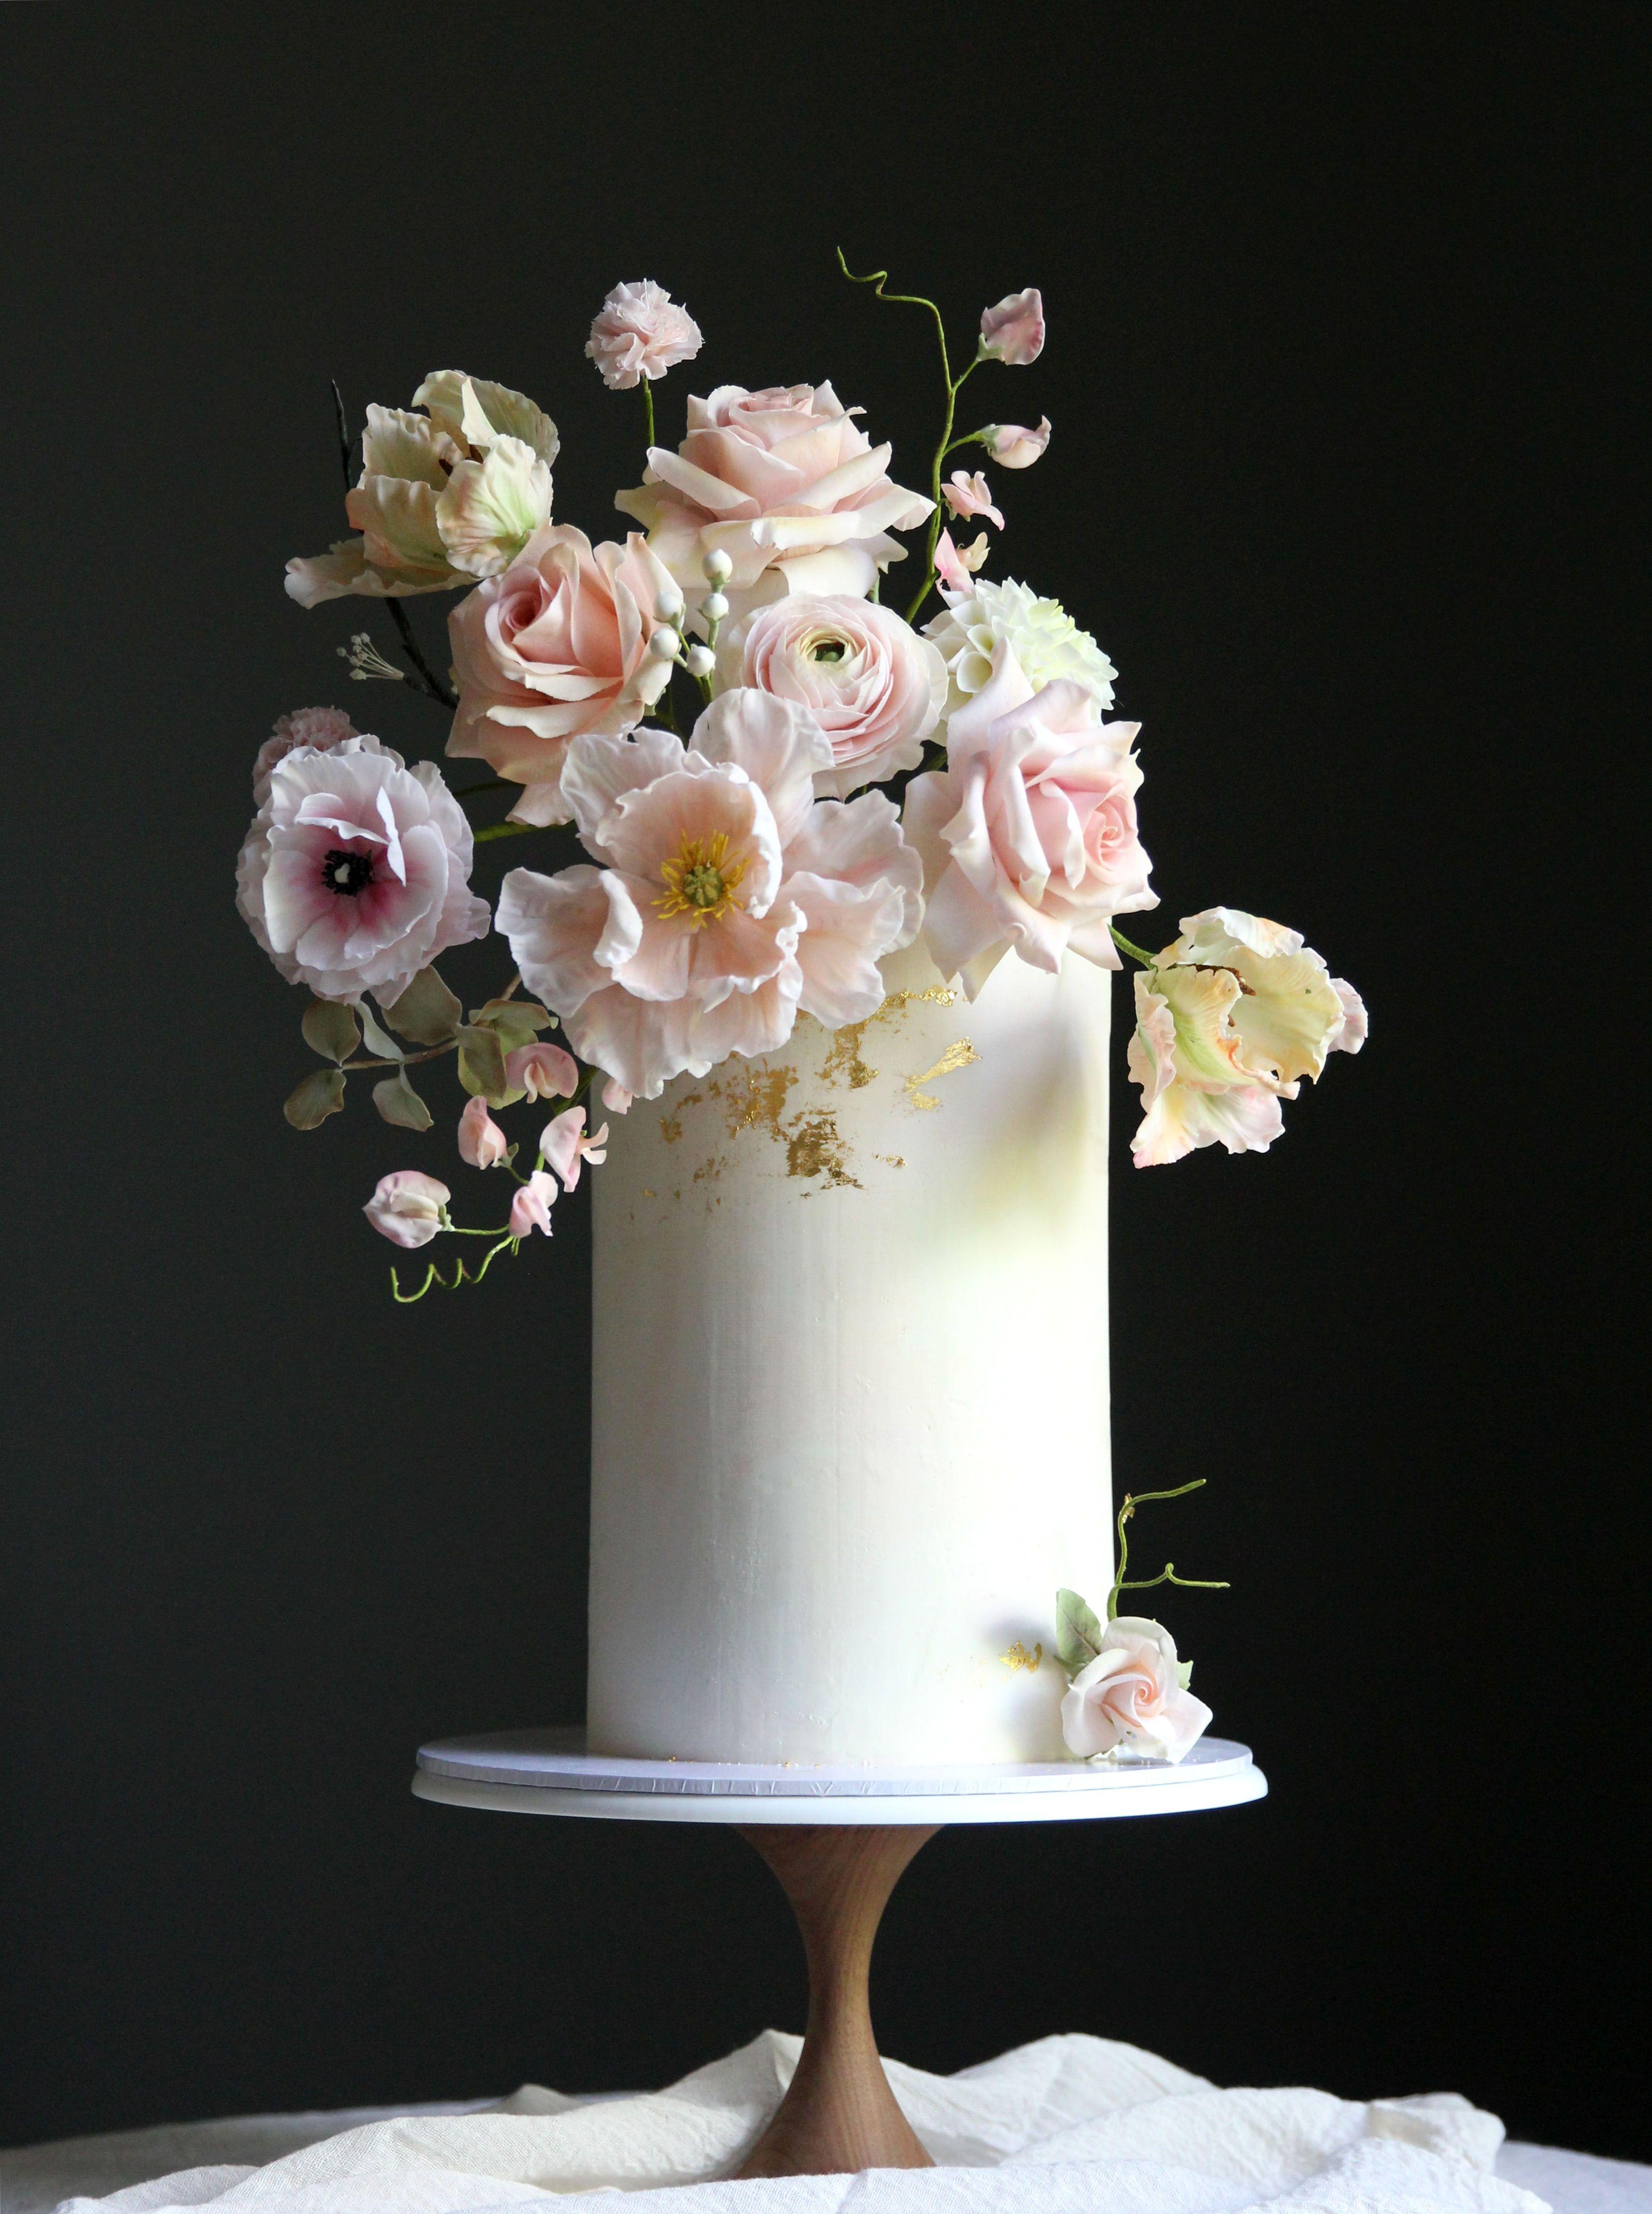 18+ Gum paste flowers for wedding cakes ideas